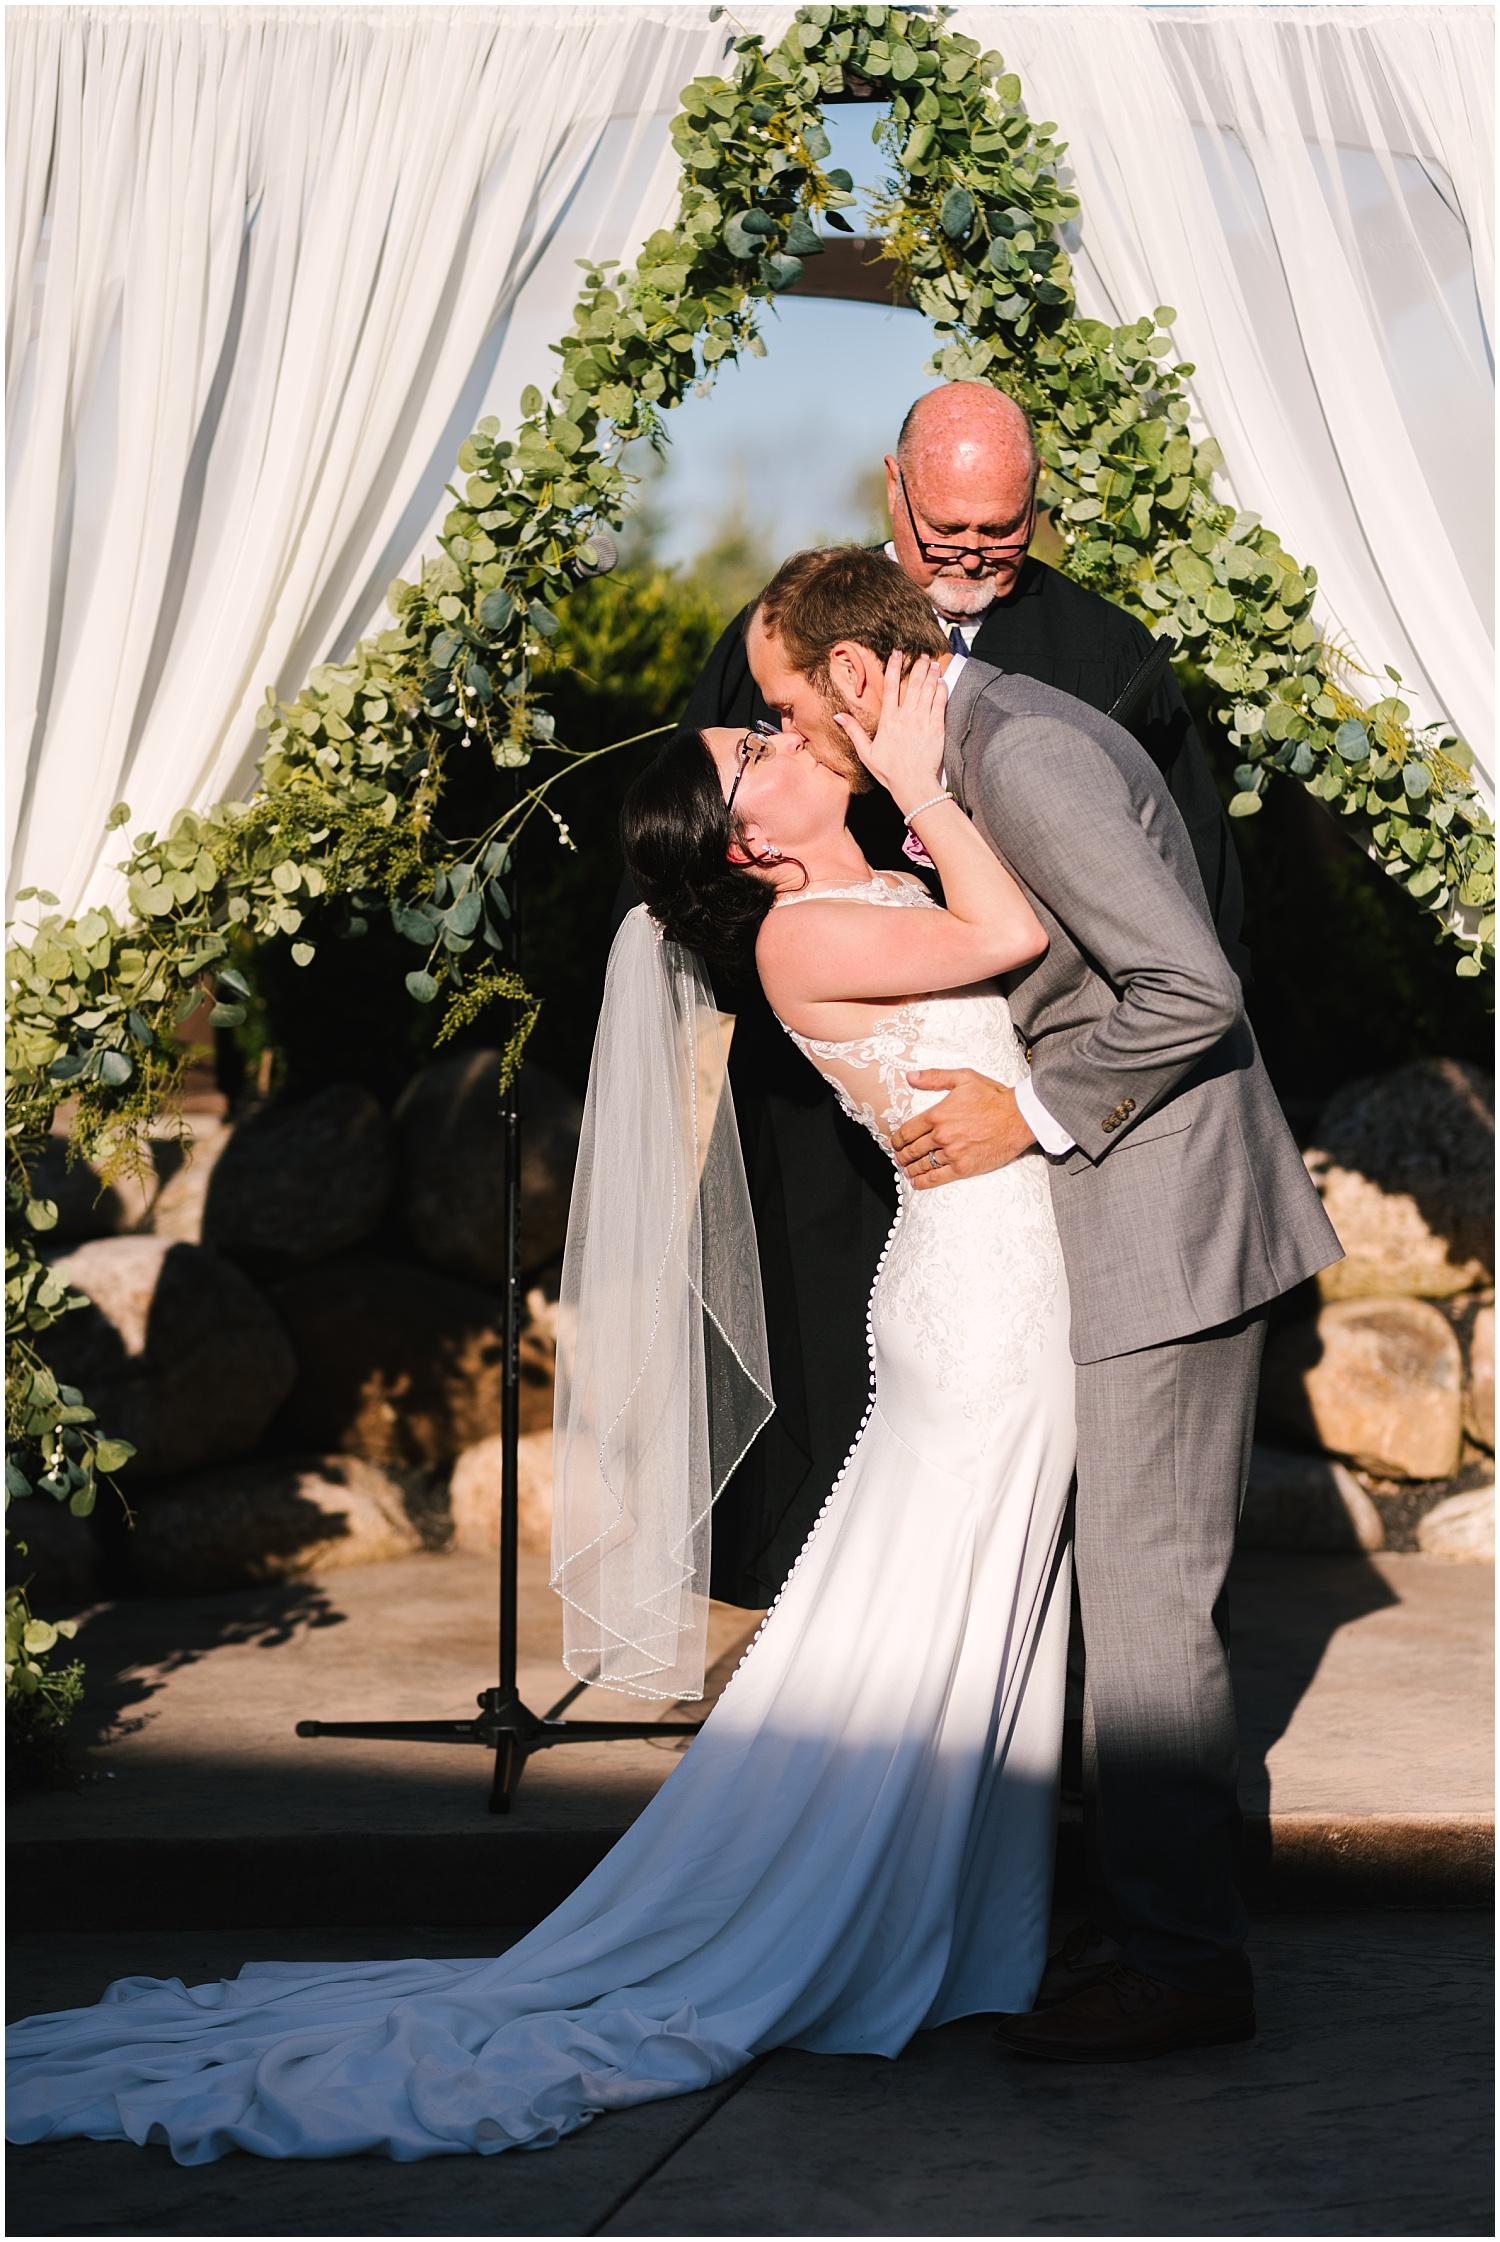 deerfield+country+club+wedding+rochester+NY+photographer (76).jpg